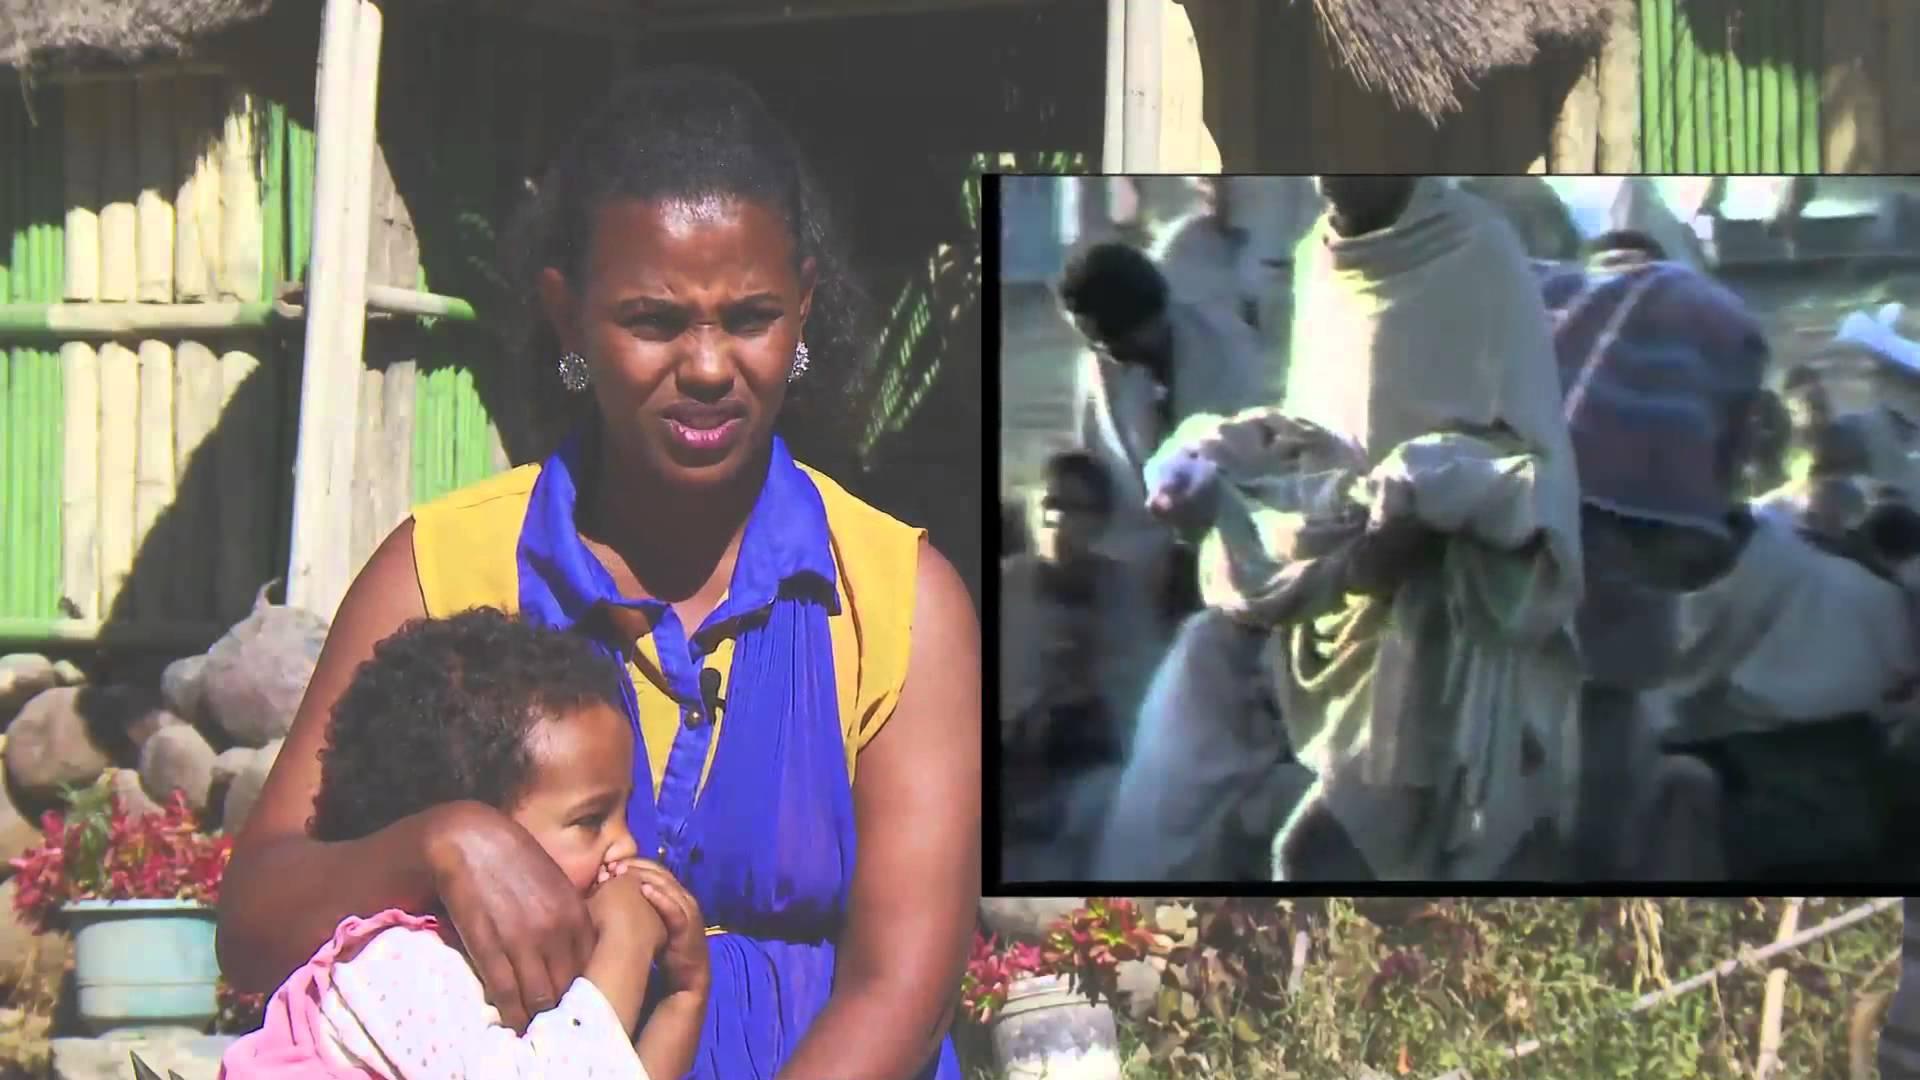 ETHIOPIA: Korem 30 Years Ago - Must Watch